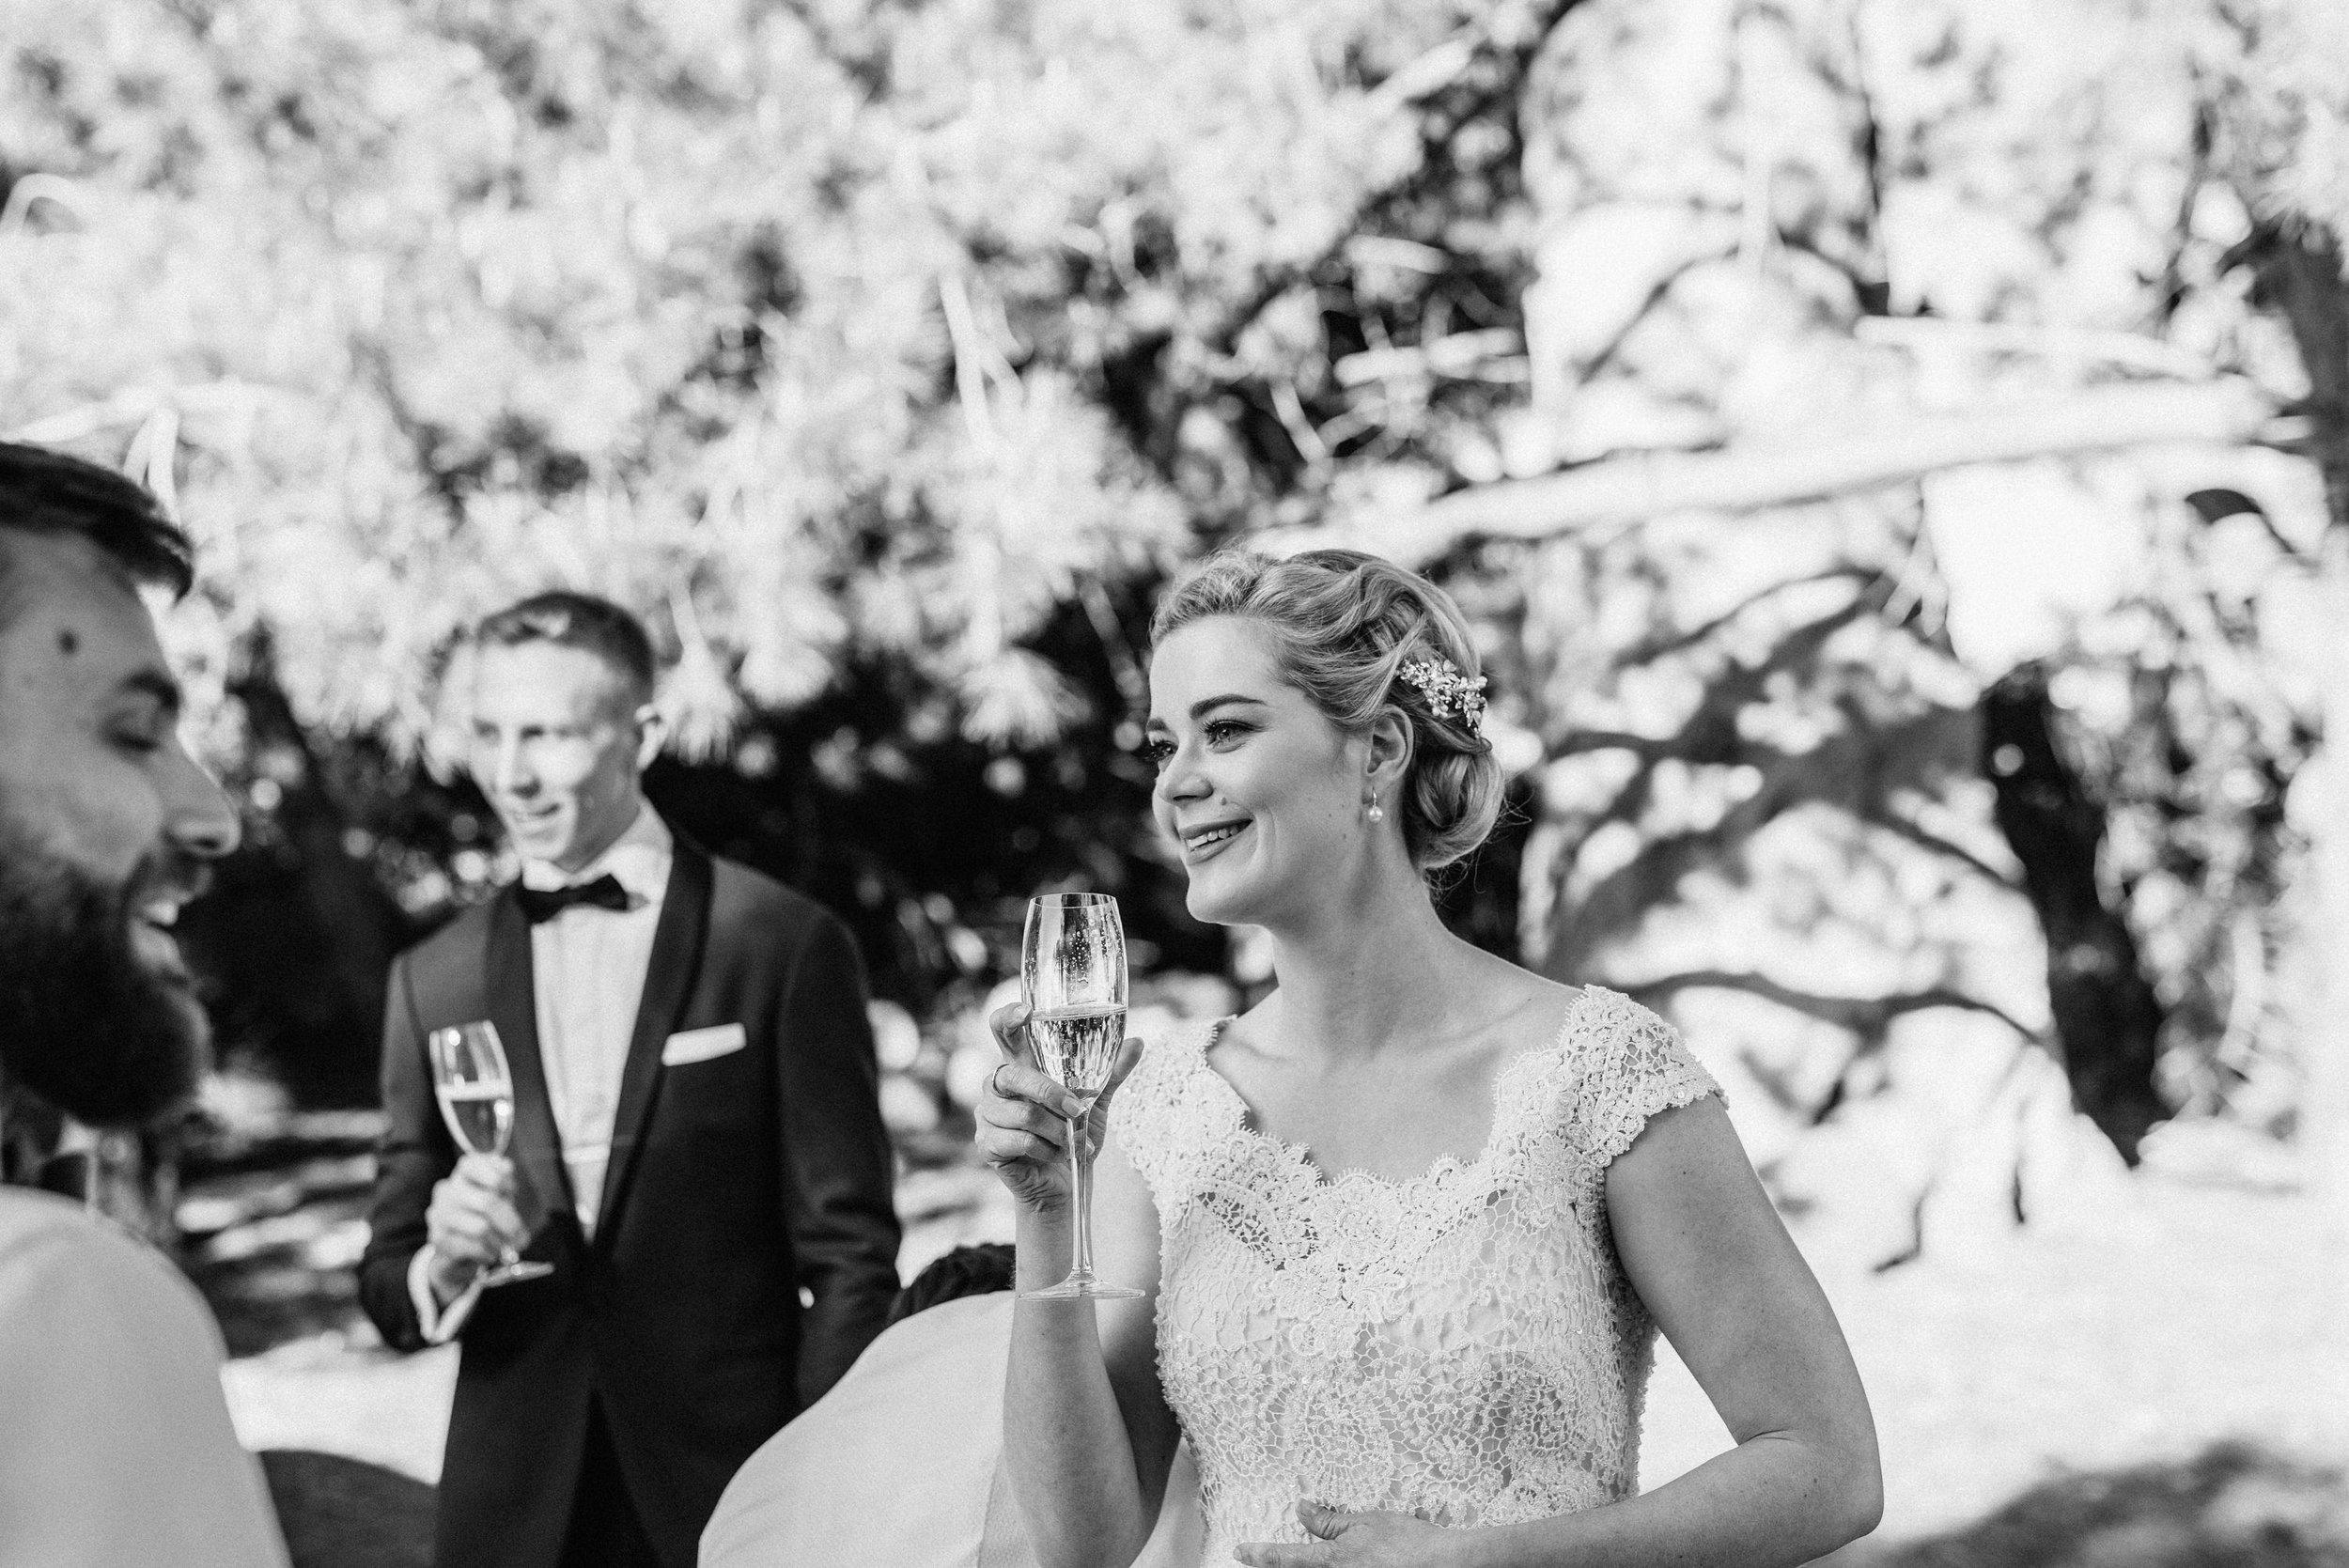 Josef-Chromy-Wedding-51.jpg